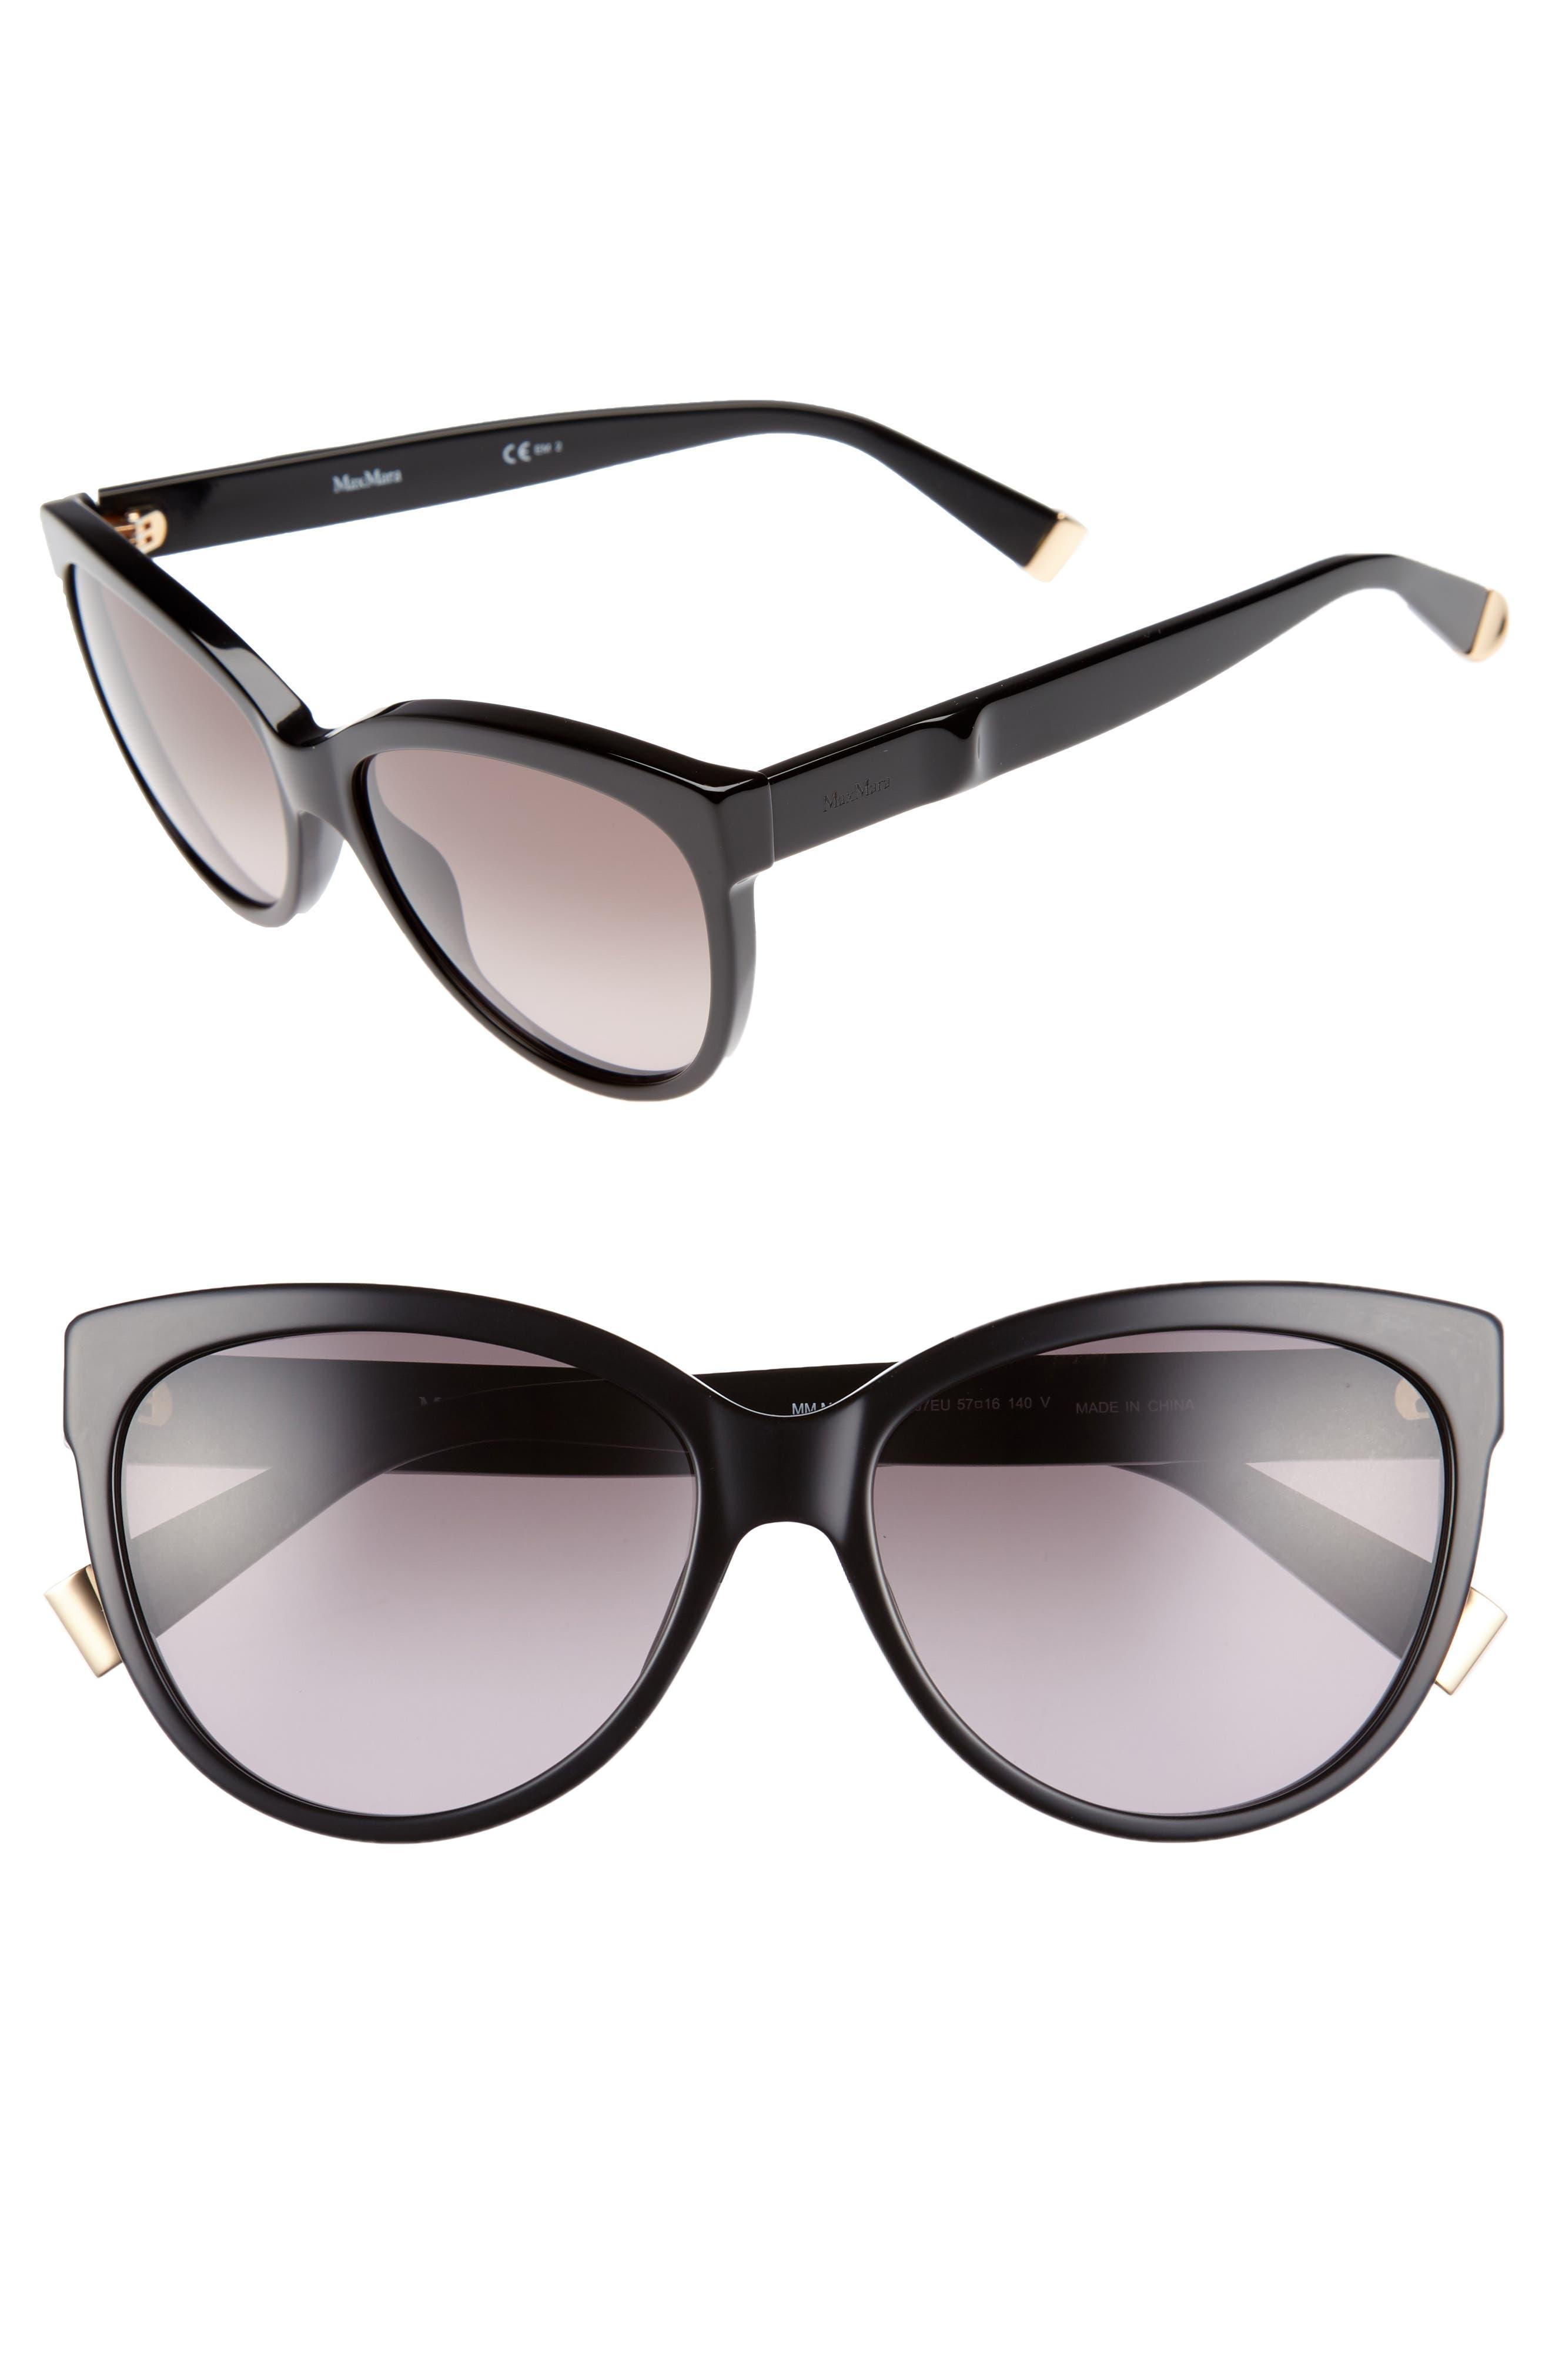 Moderii 57mm Gradient Cat Eye Sunglasses,                         Main,                         color, 001